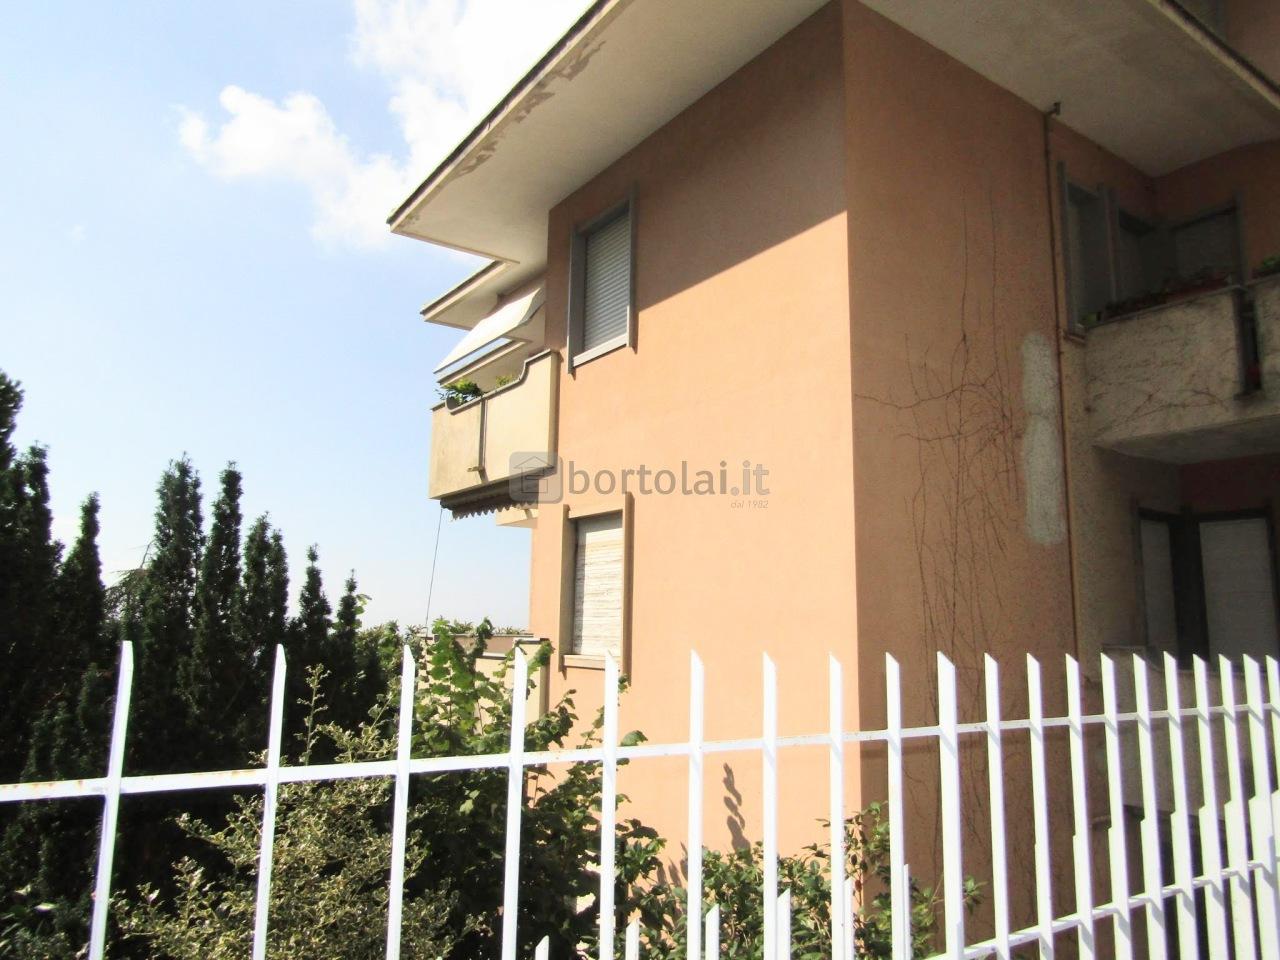 genova vendita quart: castelletto immobiliare bortolai.it srl